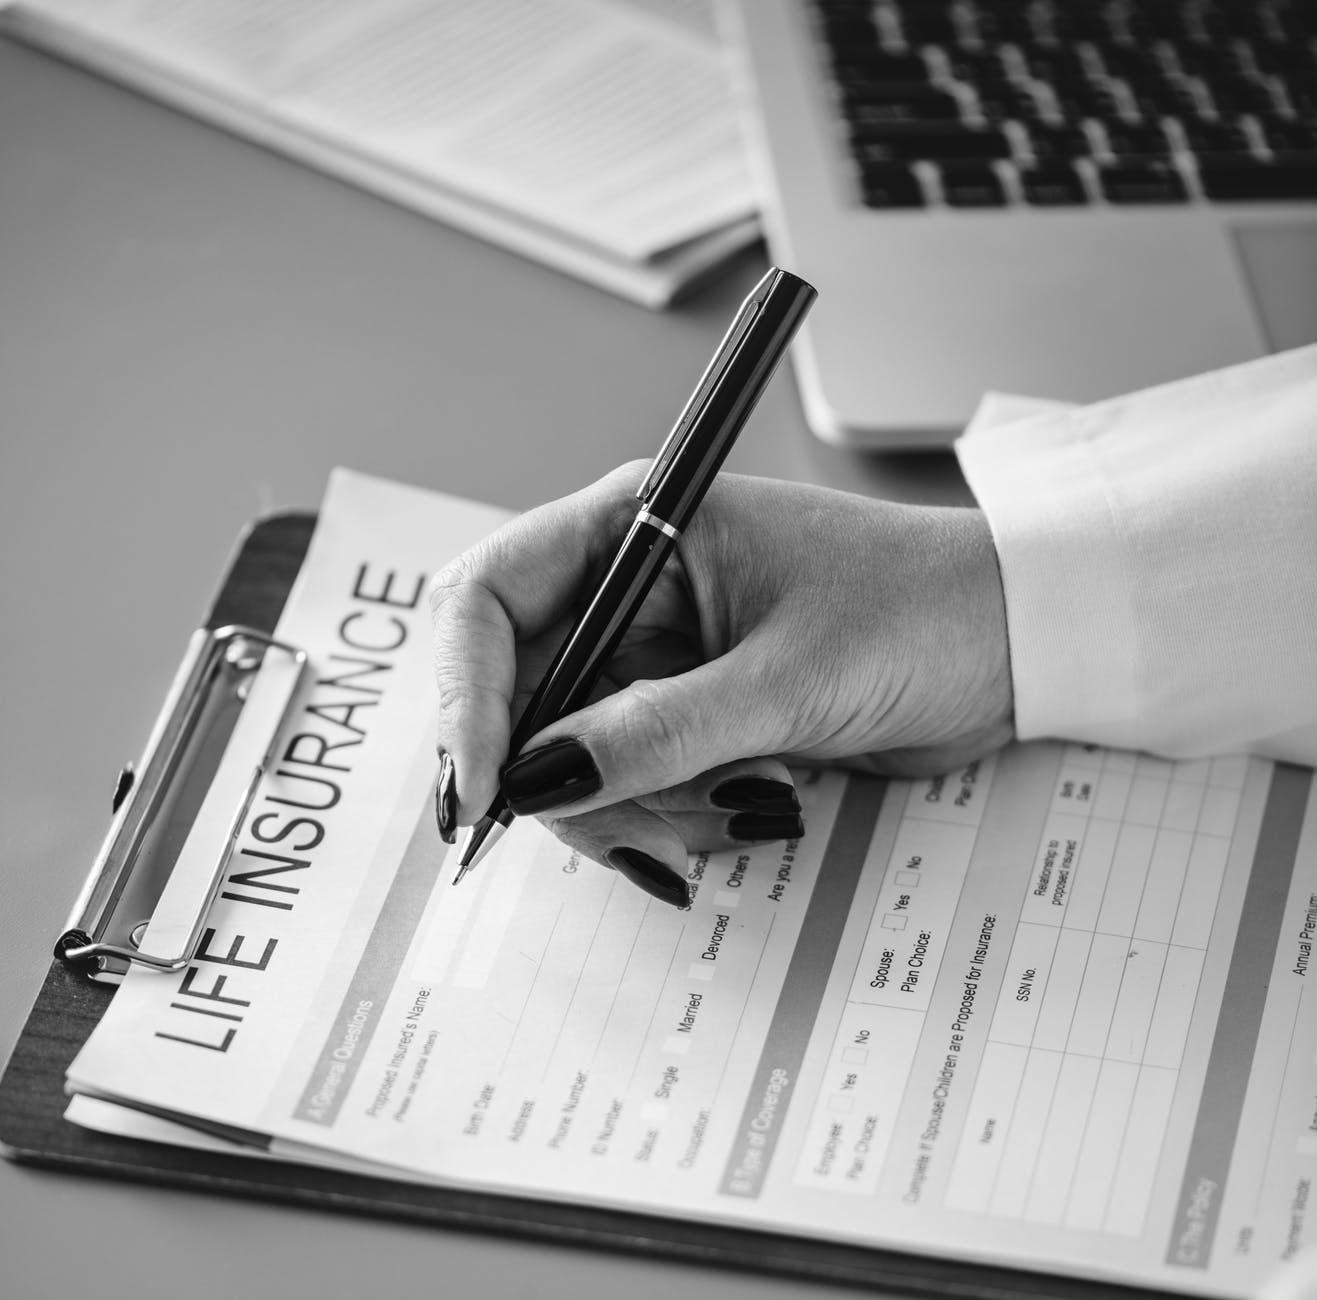 material misrepresentation in life insurance